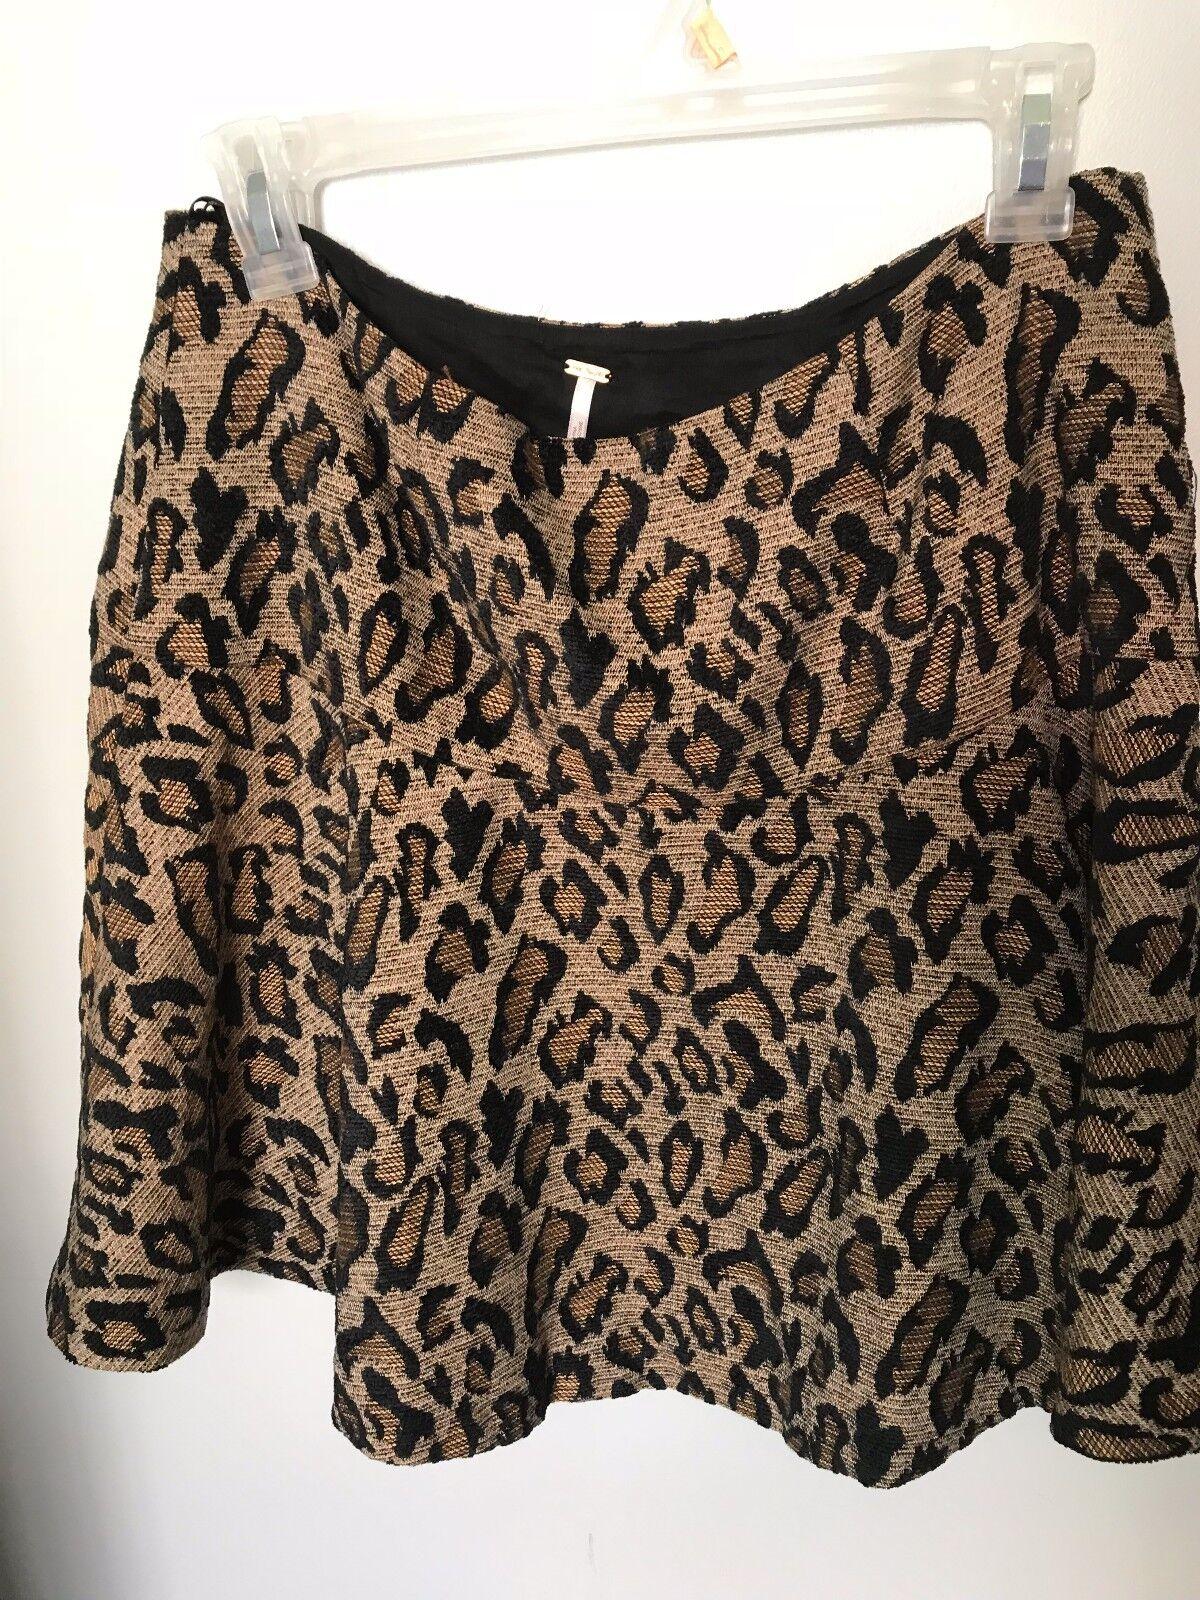 Free People Leopard Skirt -Size 10